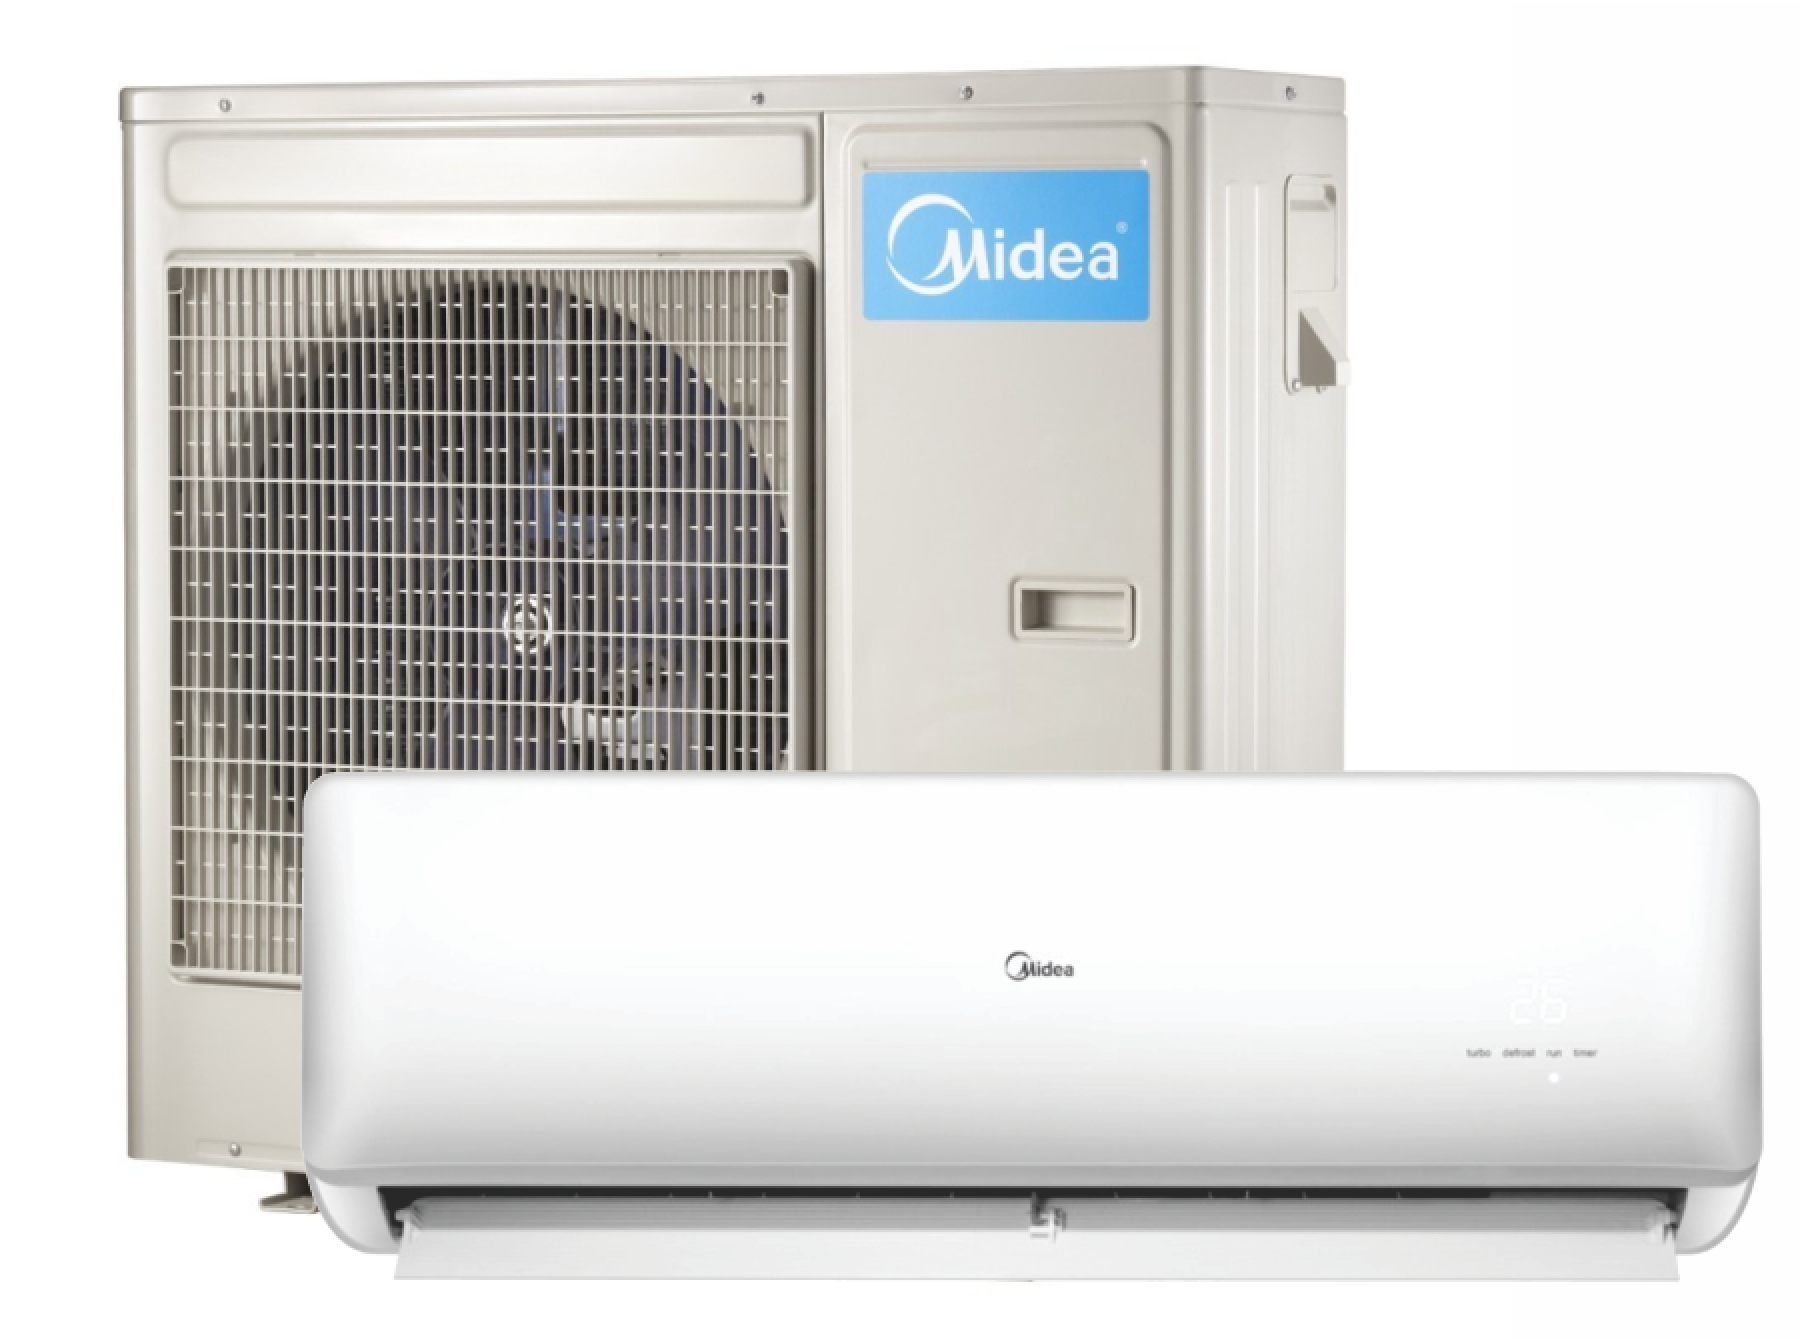 Midea Air Conditioner Installation Manual Wiring Diagram